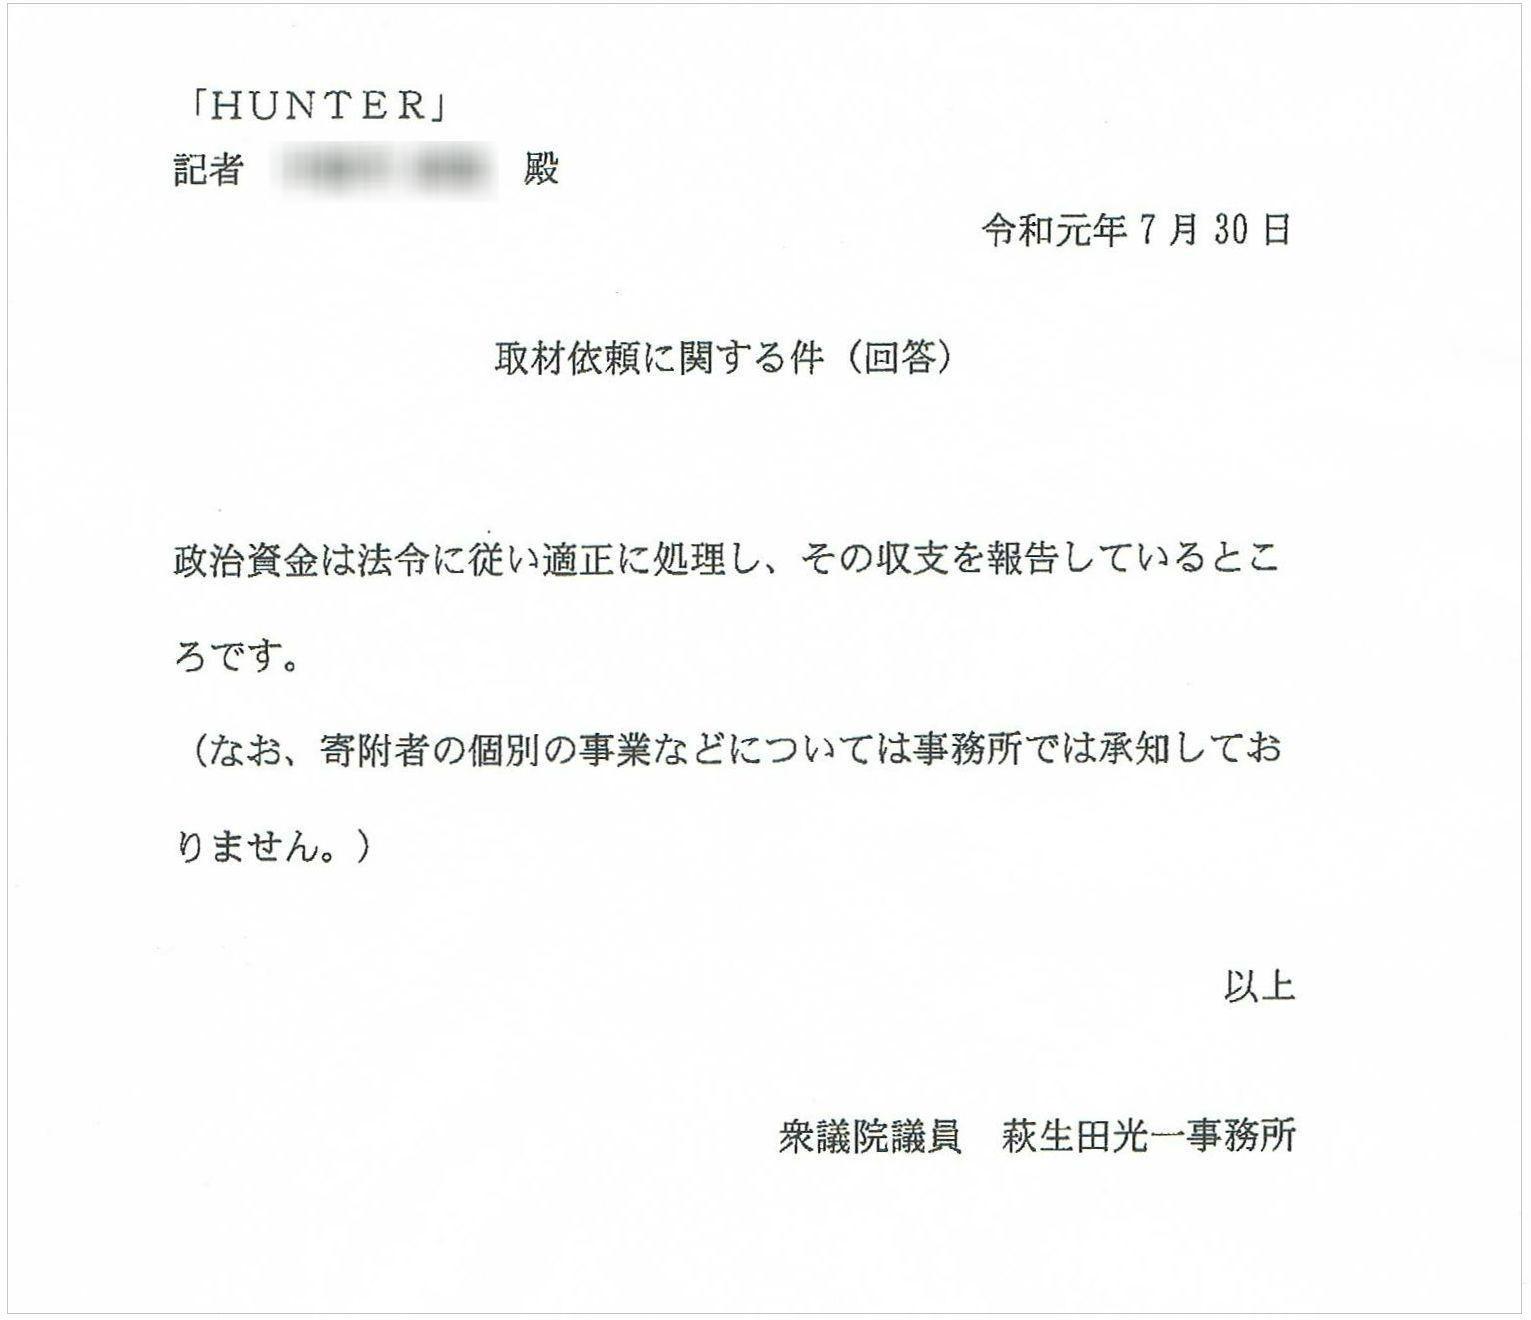 http://hunter-investigate.jp/news/0770bb9e67a7e6260aaf3a91c9d2a27f8df09eb7.jpg